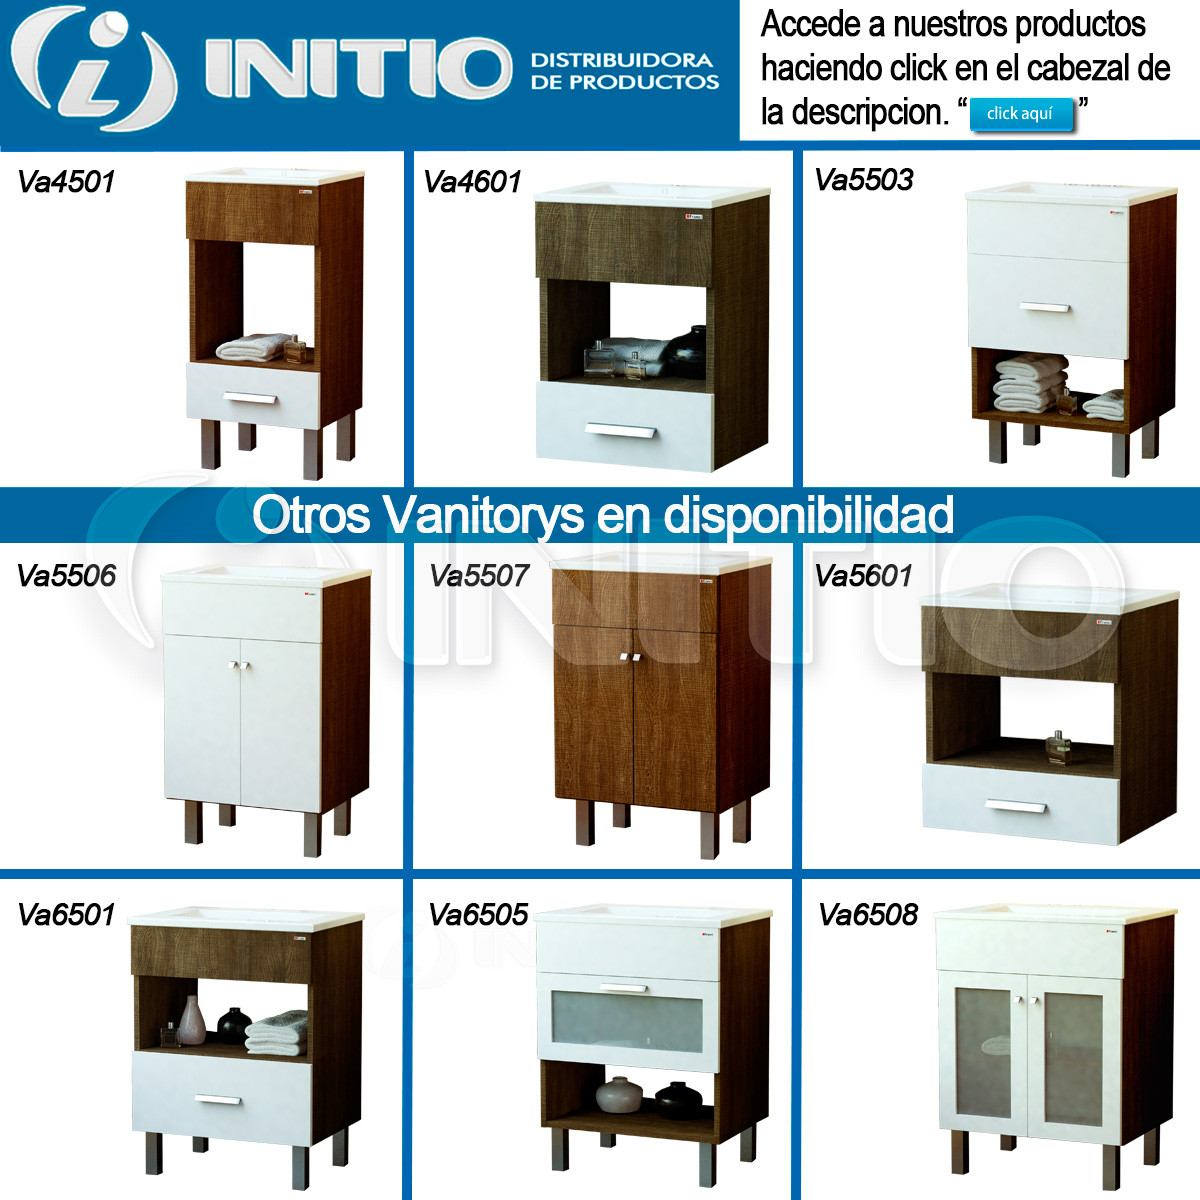 Mueble Para Ba O Organizador Fiplasto 999 00 En Mercado Libre # Muebles Fiplasto